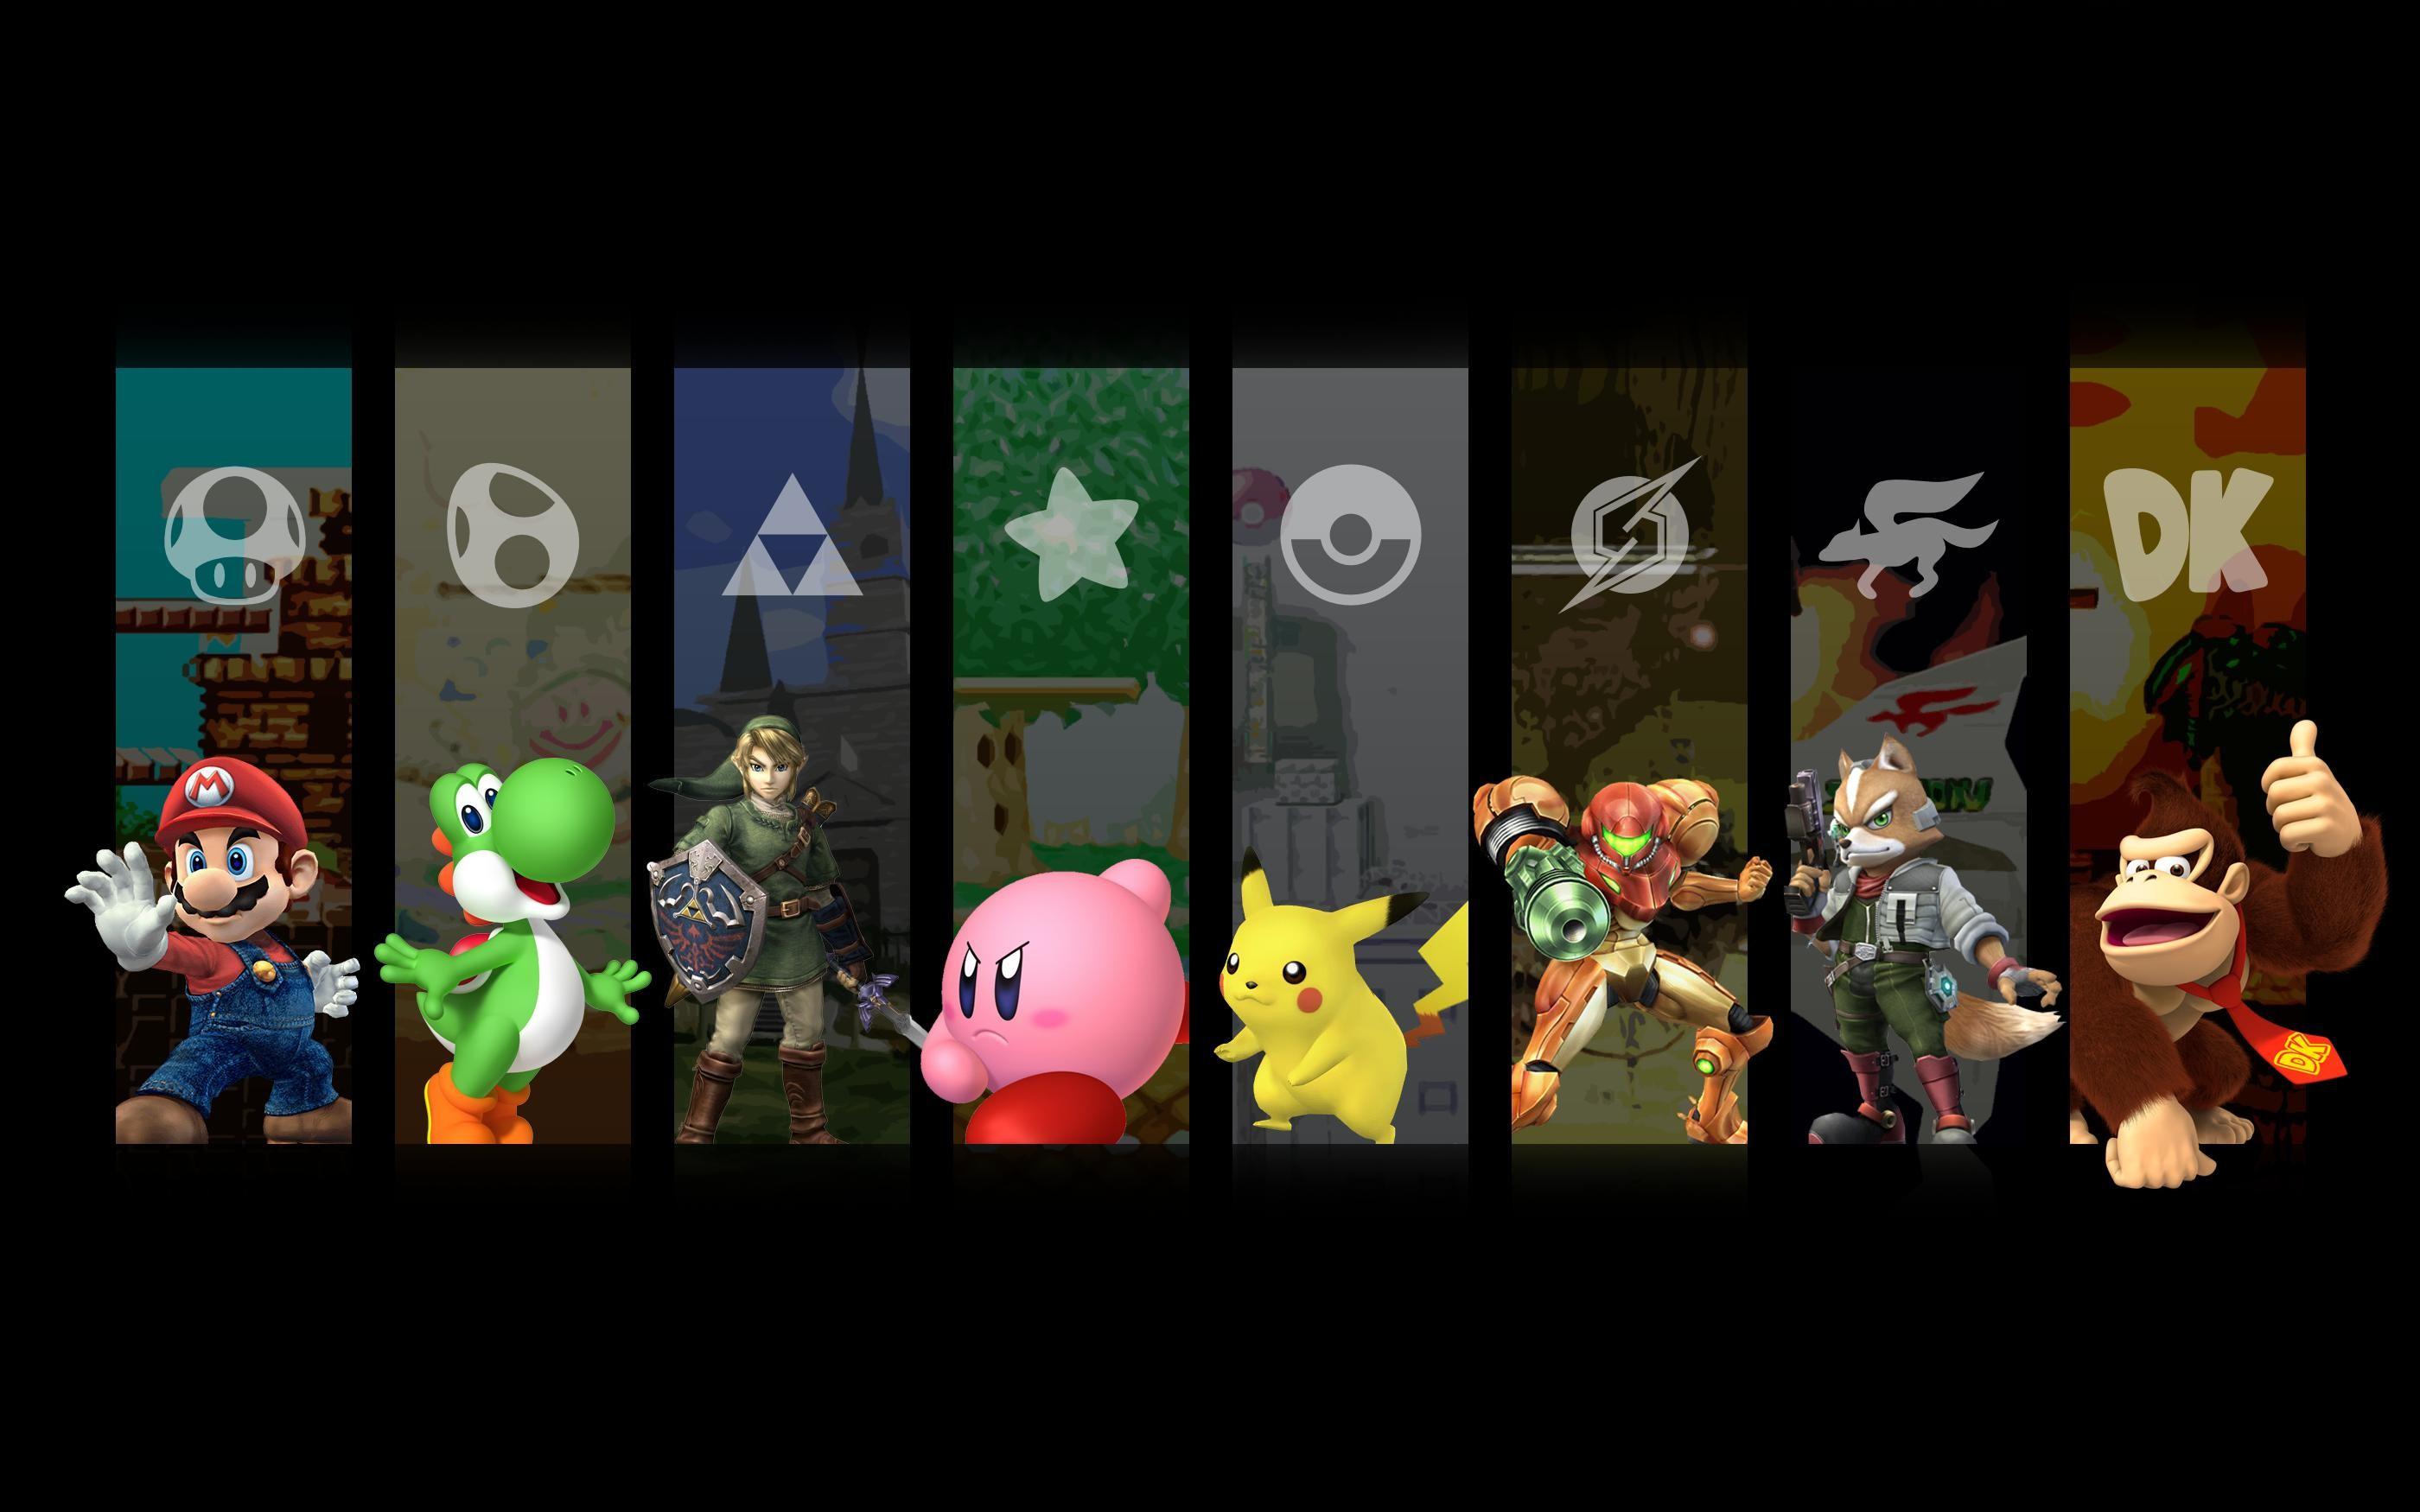 Smash Bros Wallpaper …